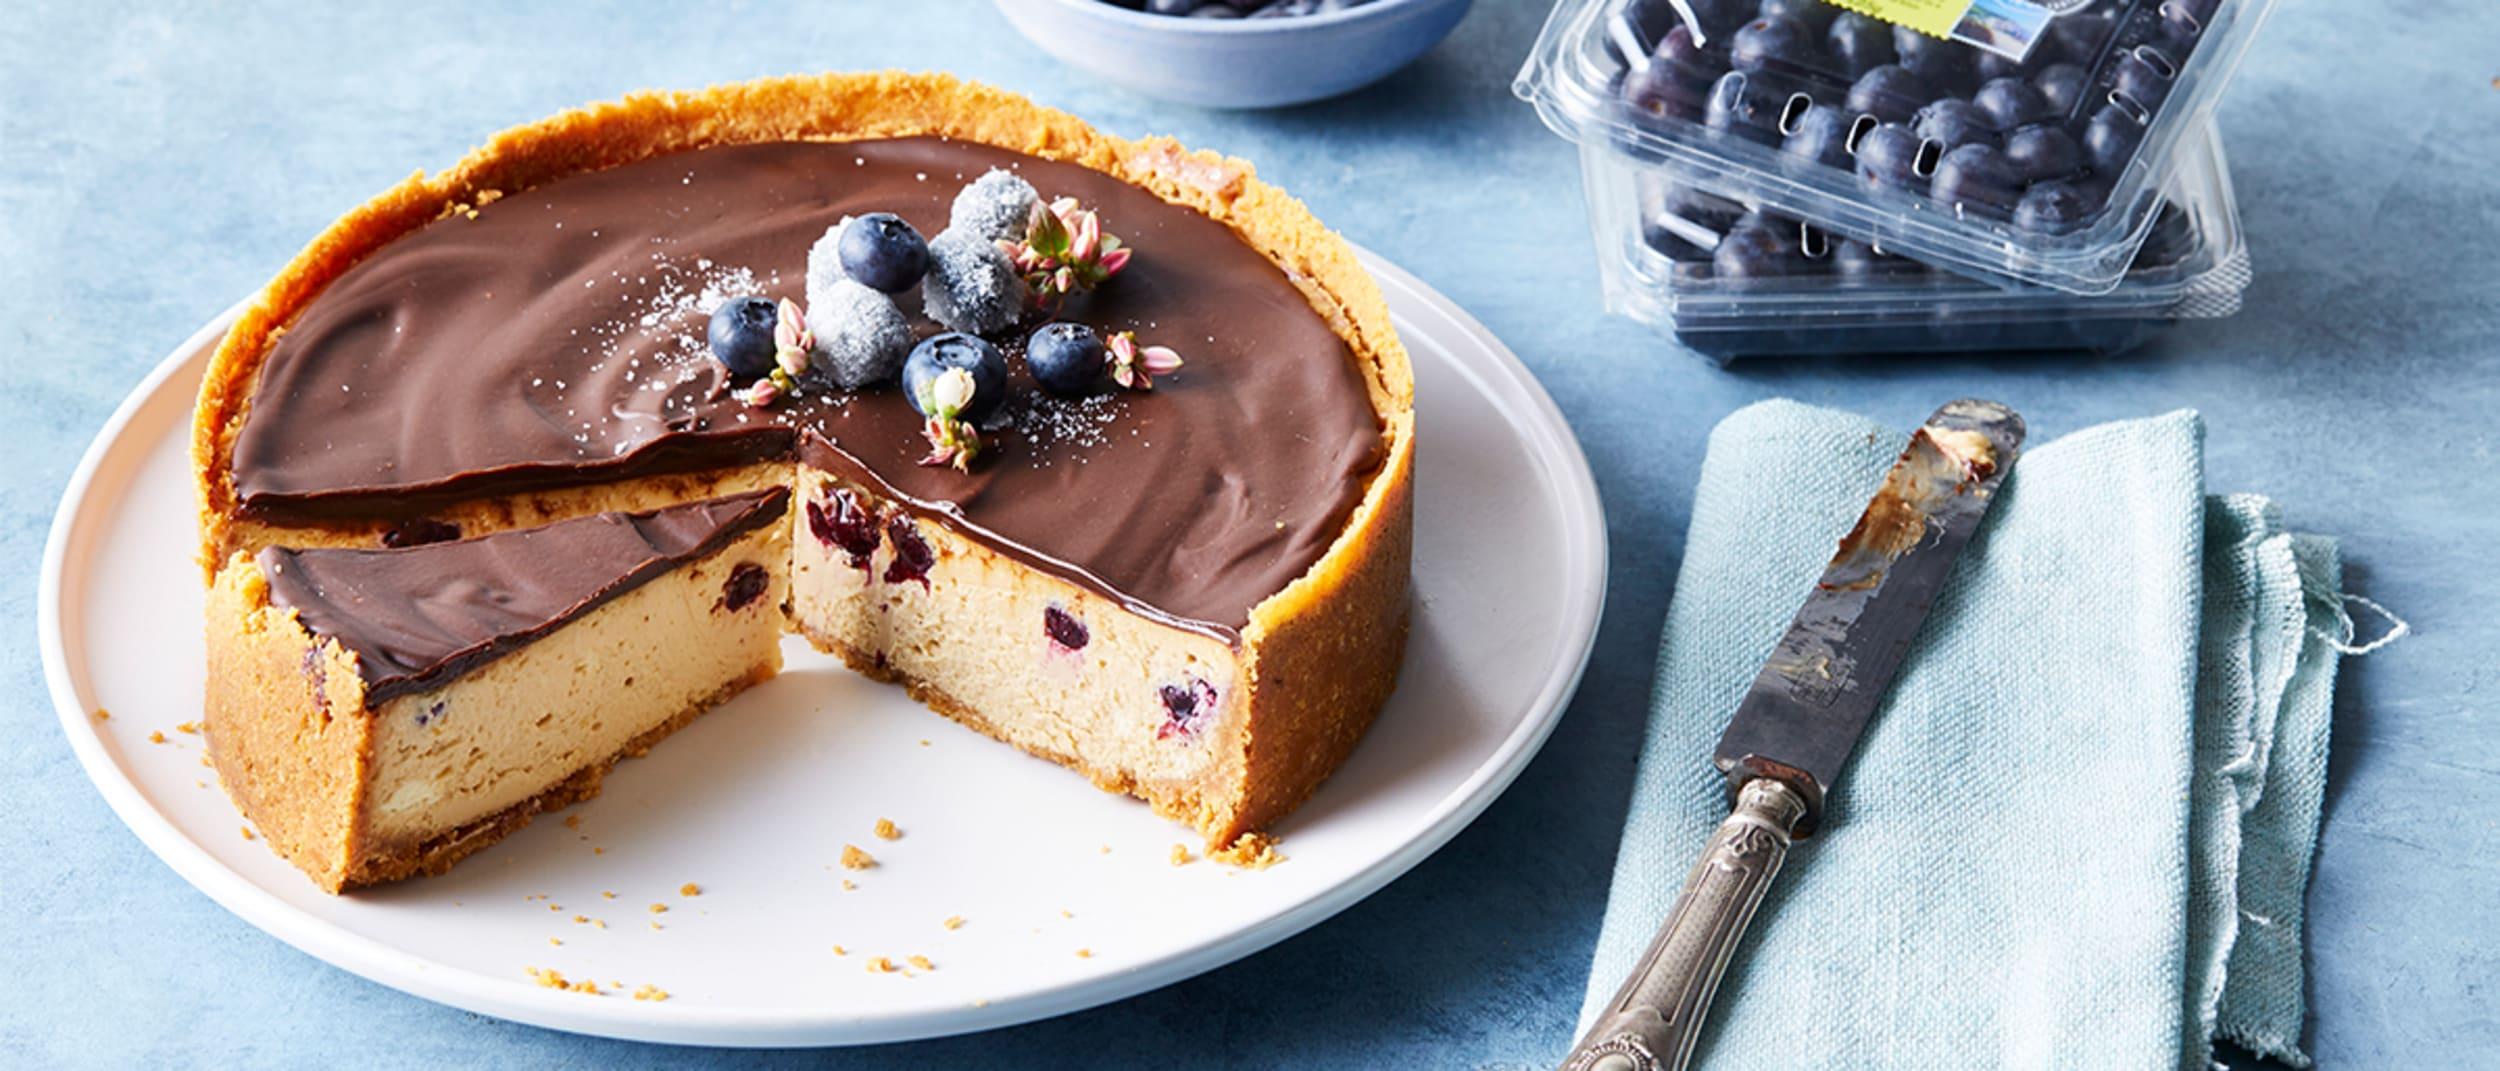 Blueberry caramel cheesecake